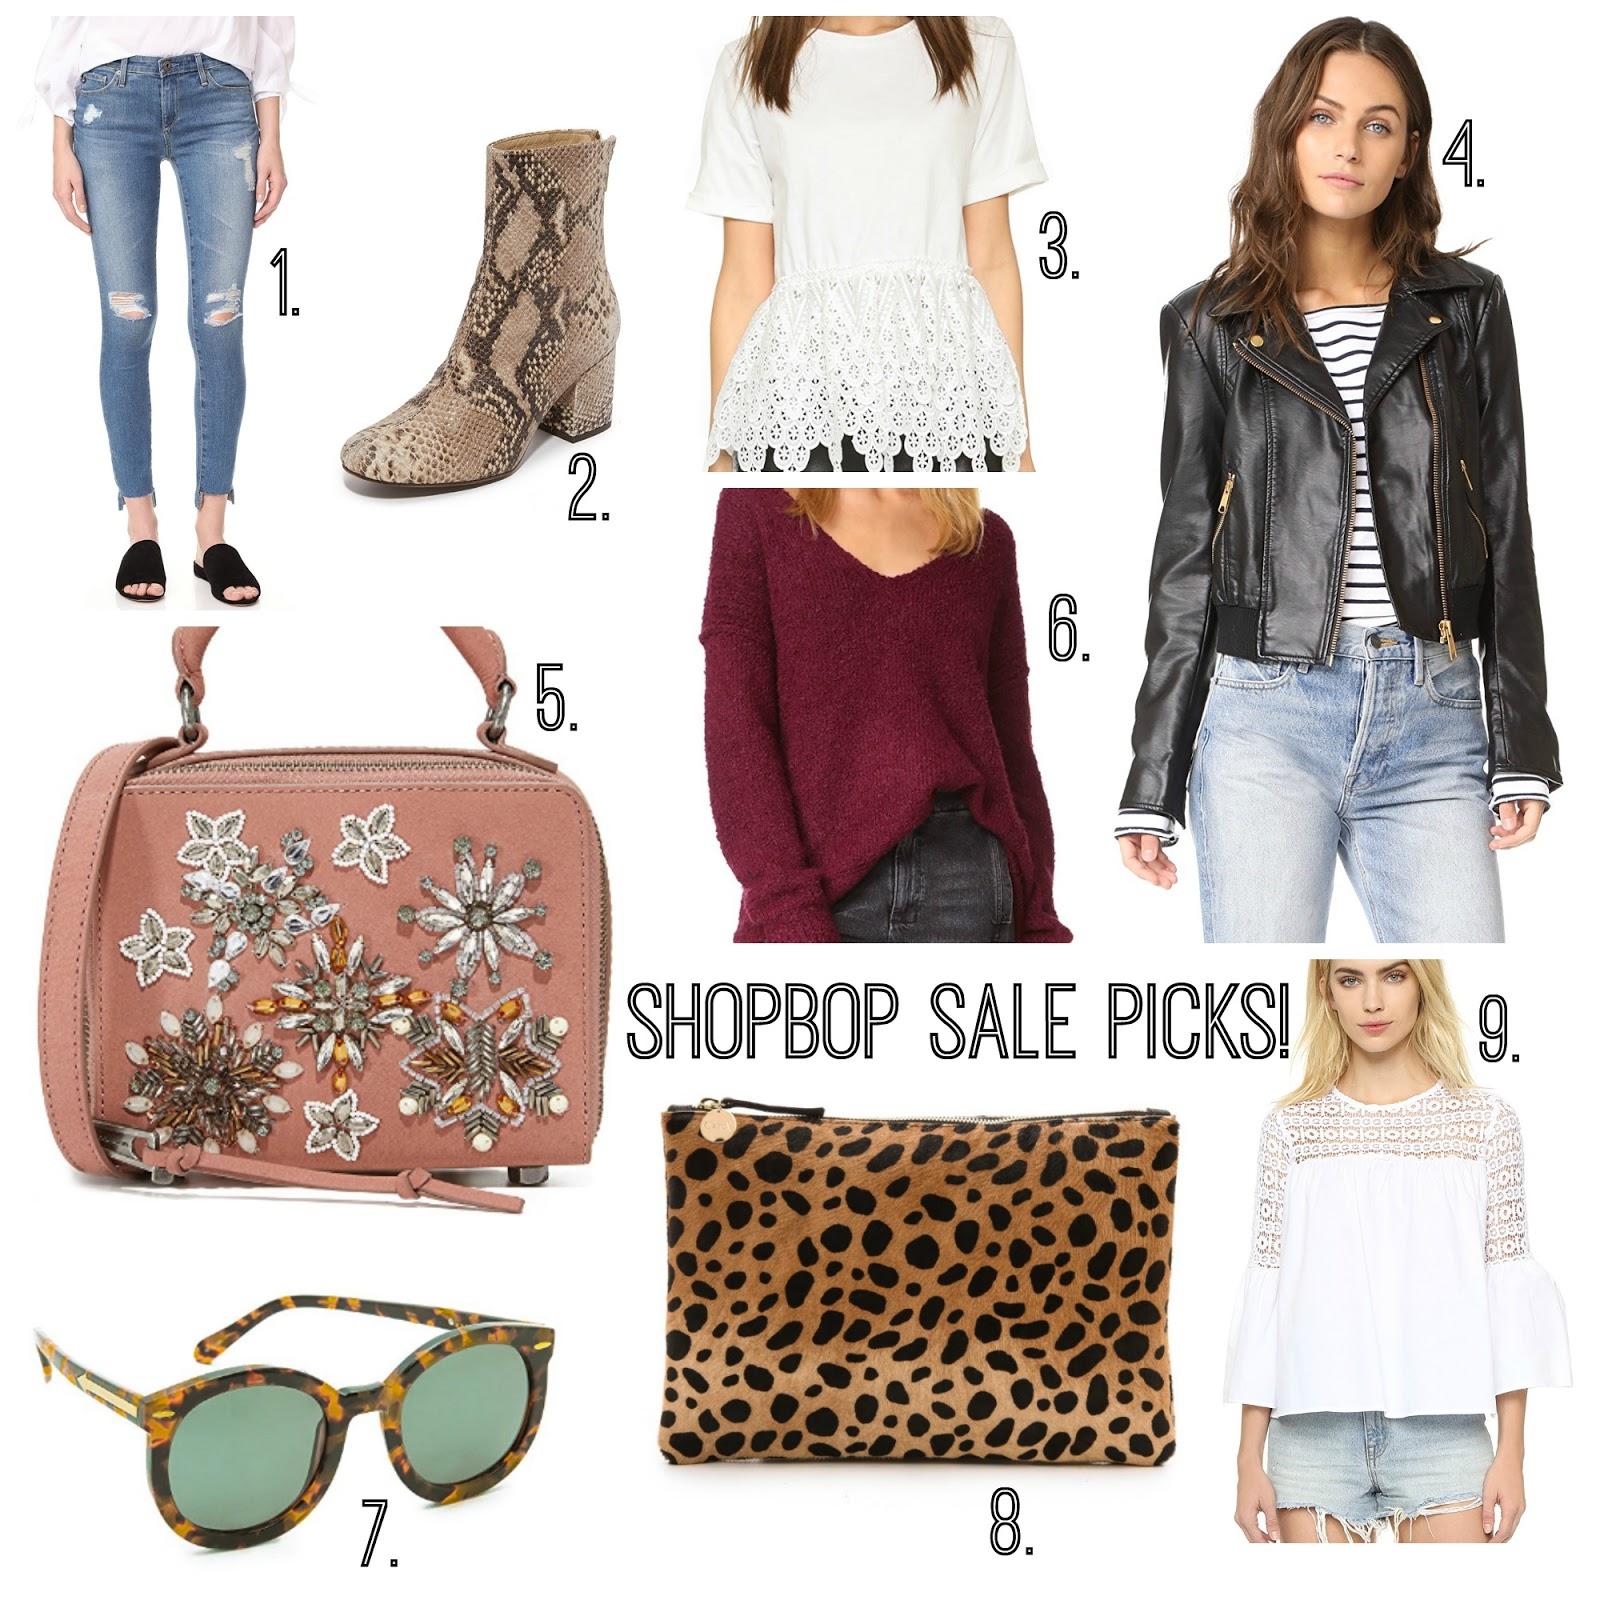 shopbop fall sale picks